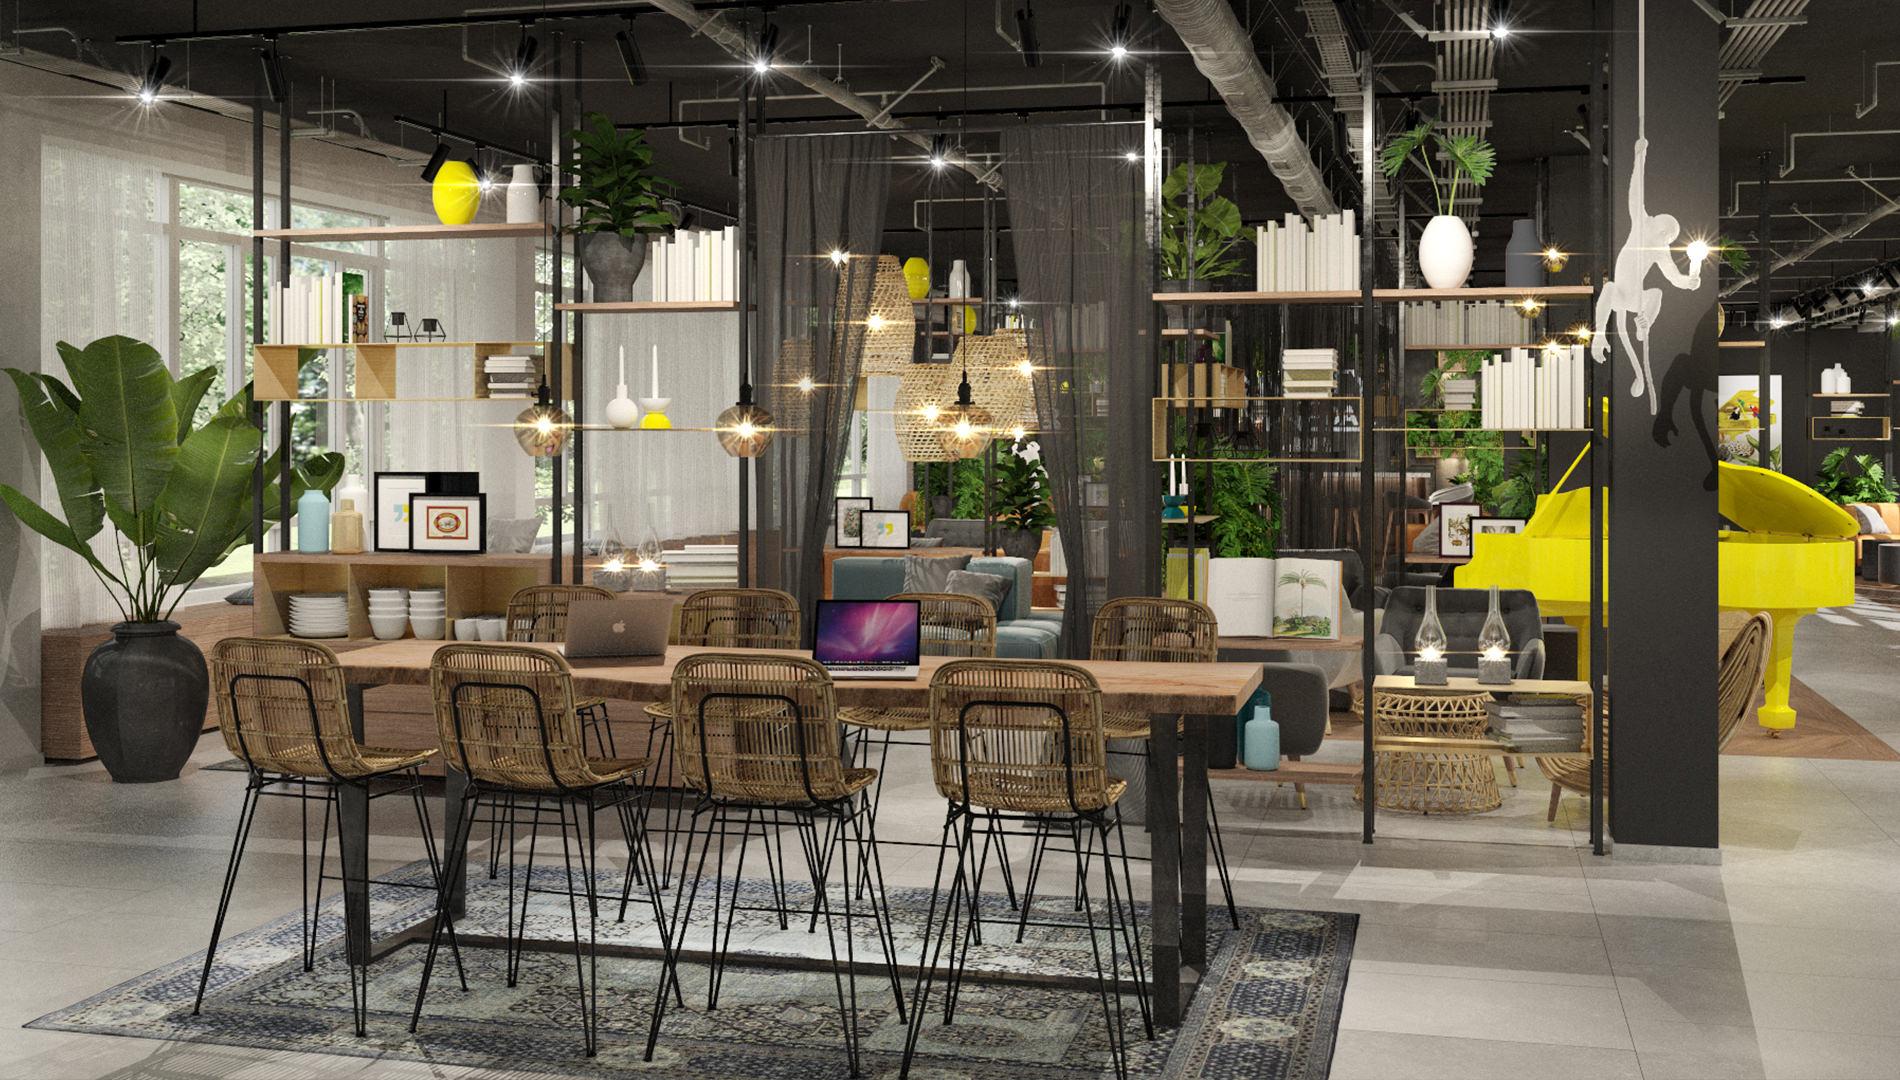 Destinationsentwicklung Ninety Nine Hotels Wuppertal Hotel Design Lounge Restaurant Going Places